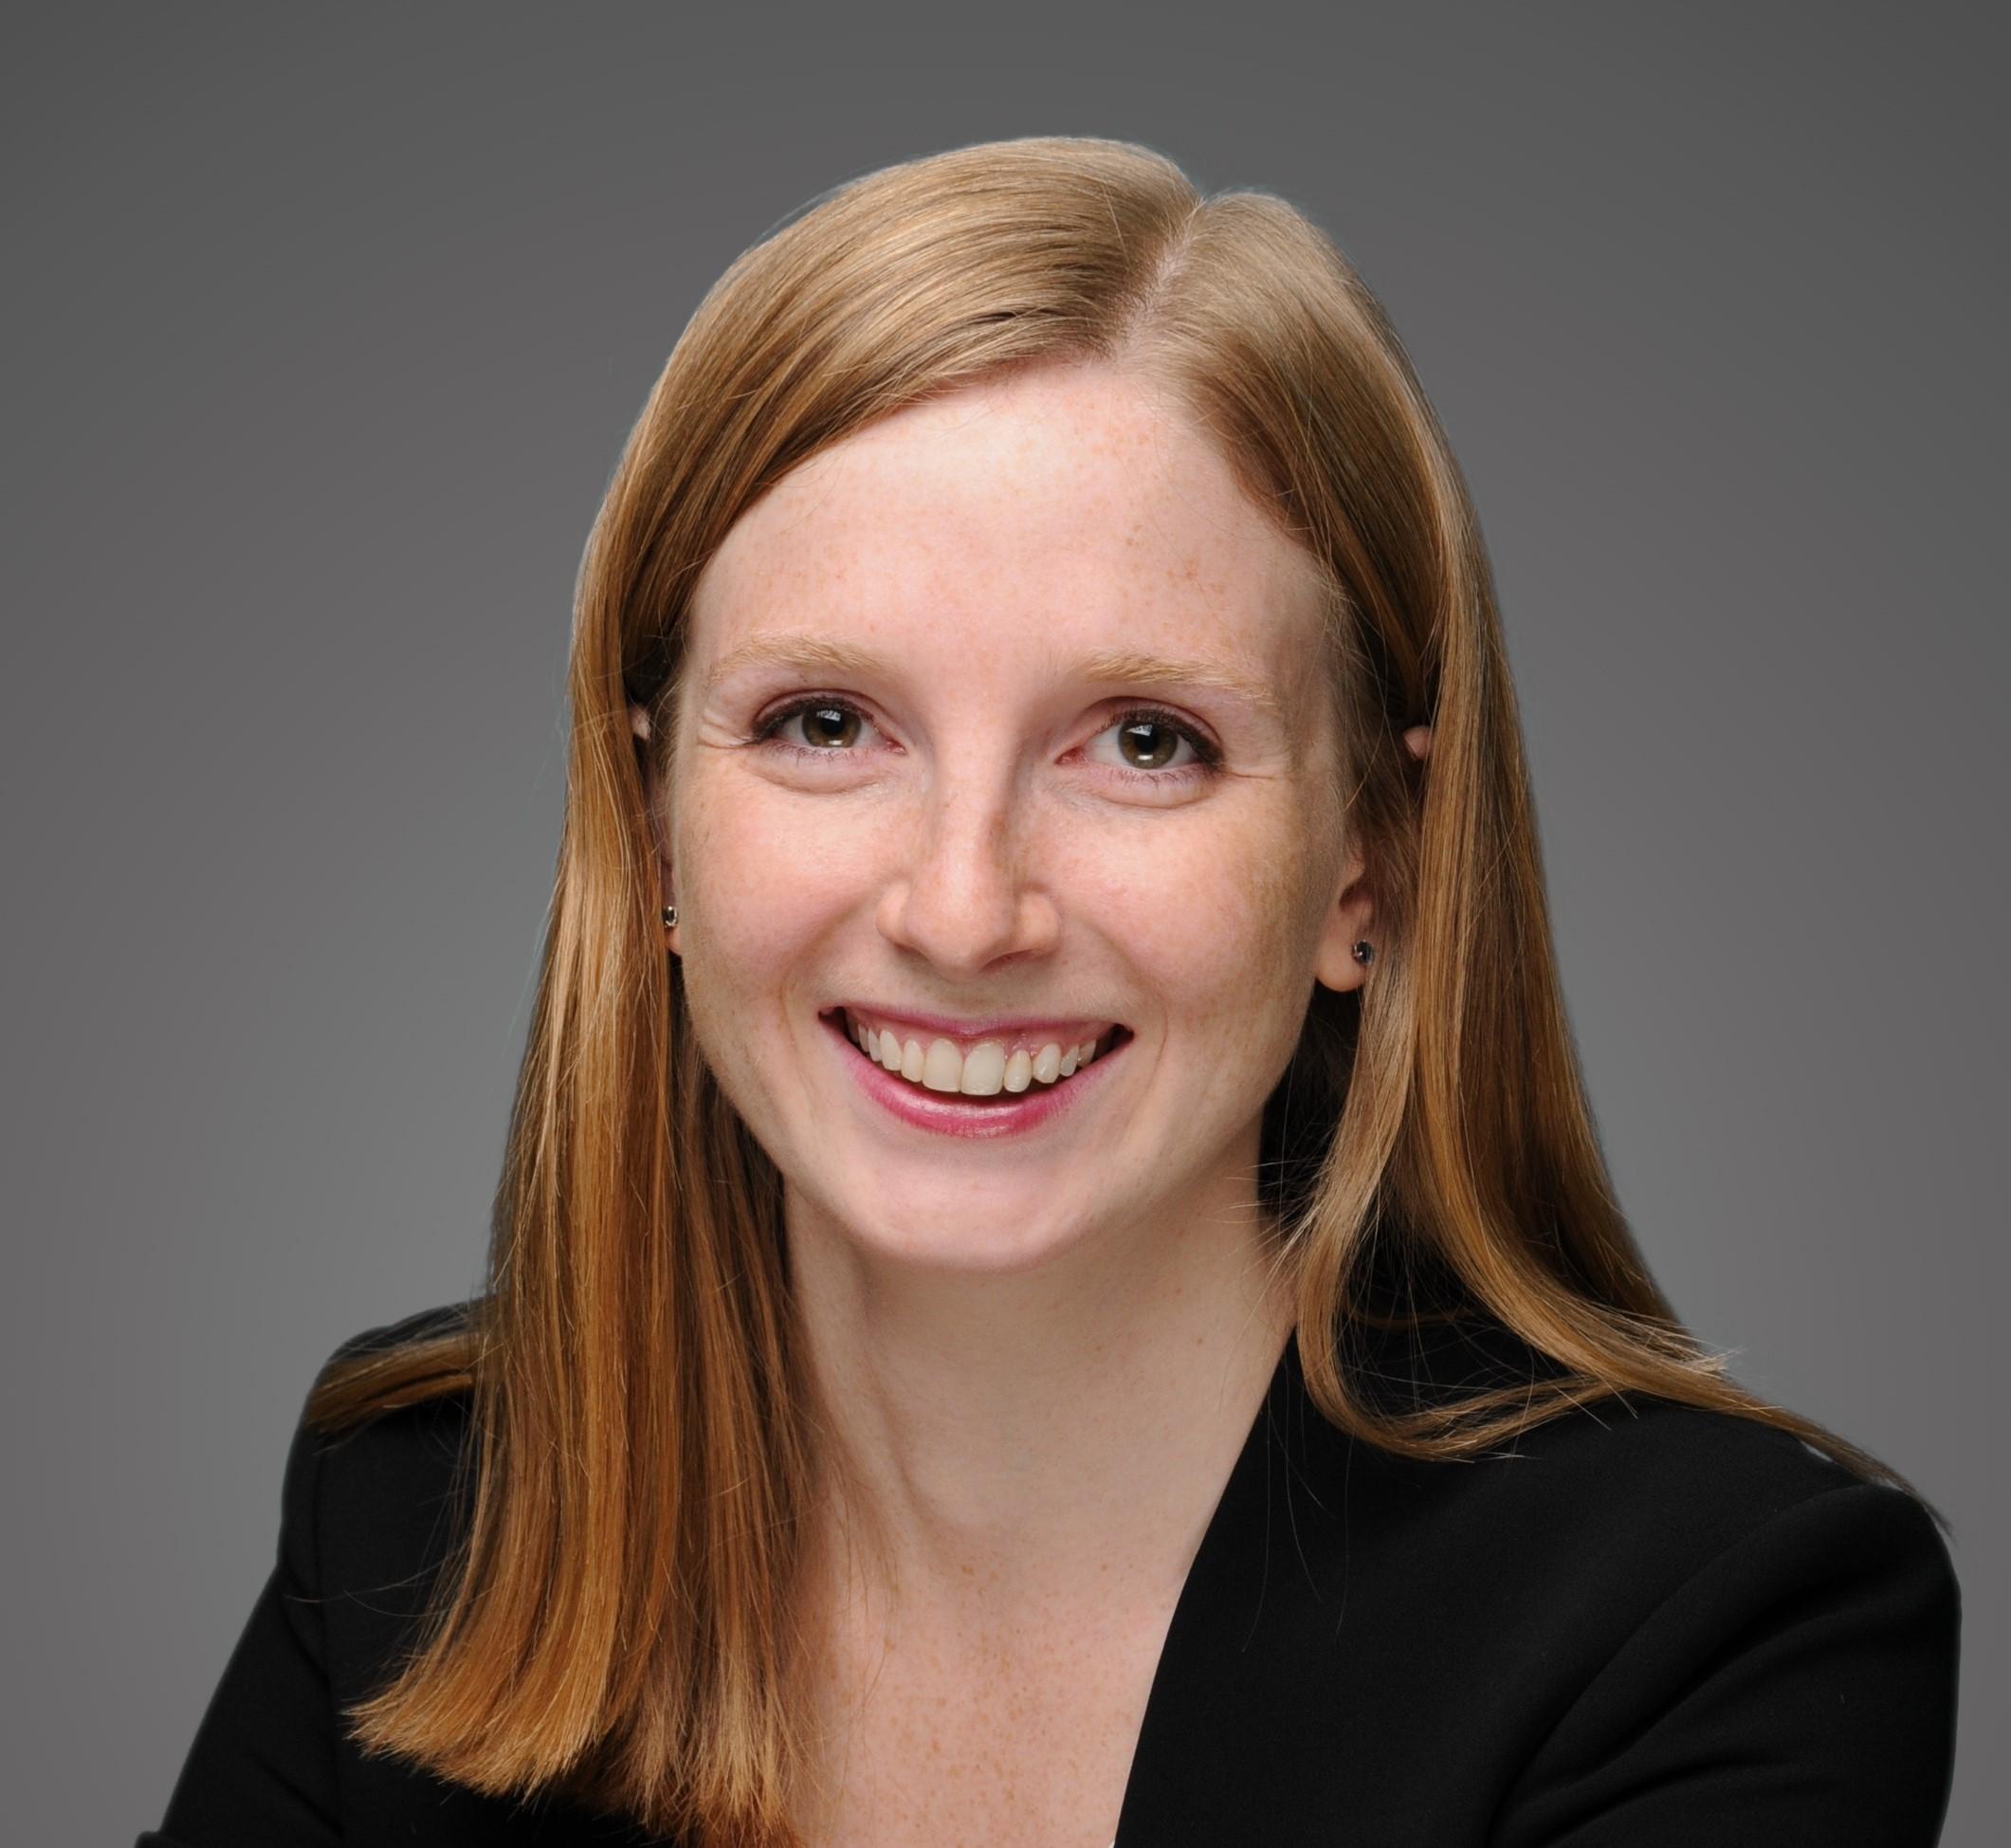 Alexandra Friedman   VP of Professional Development  Af1847@stern.nyu.edu